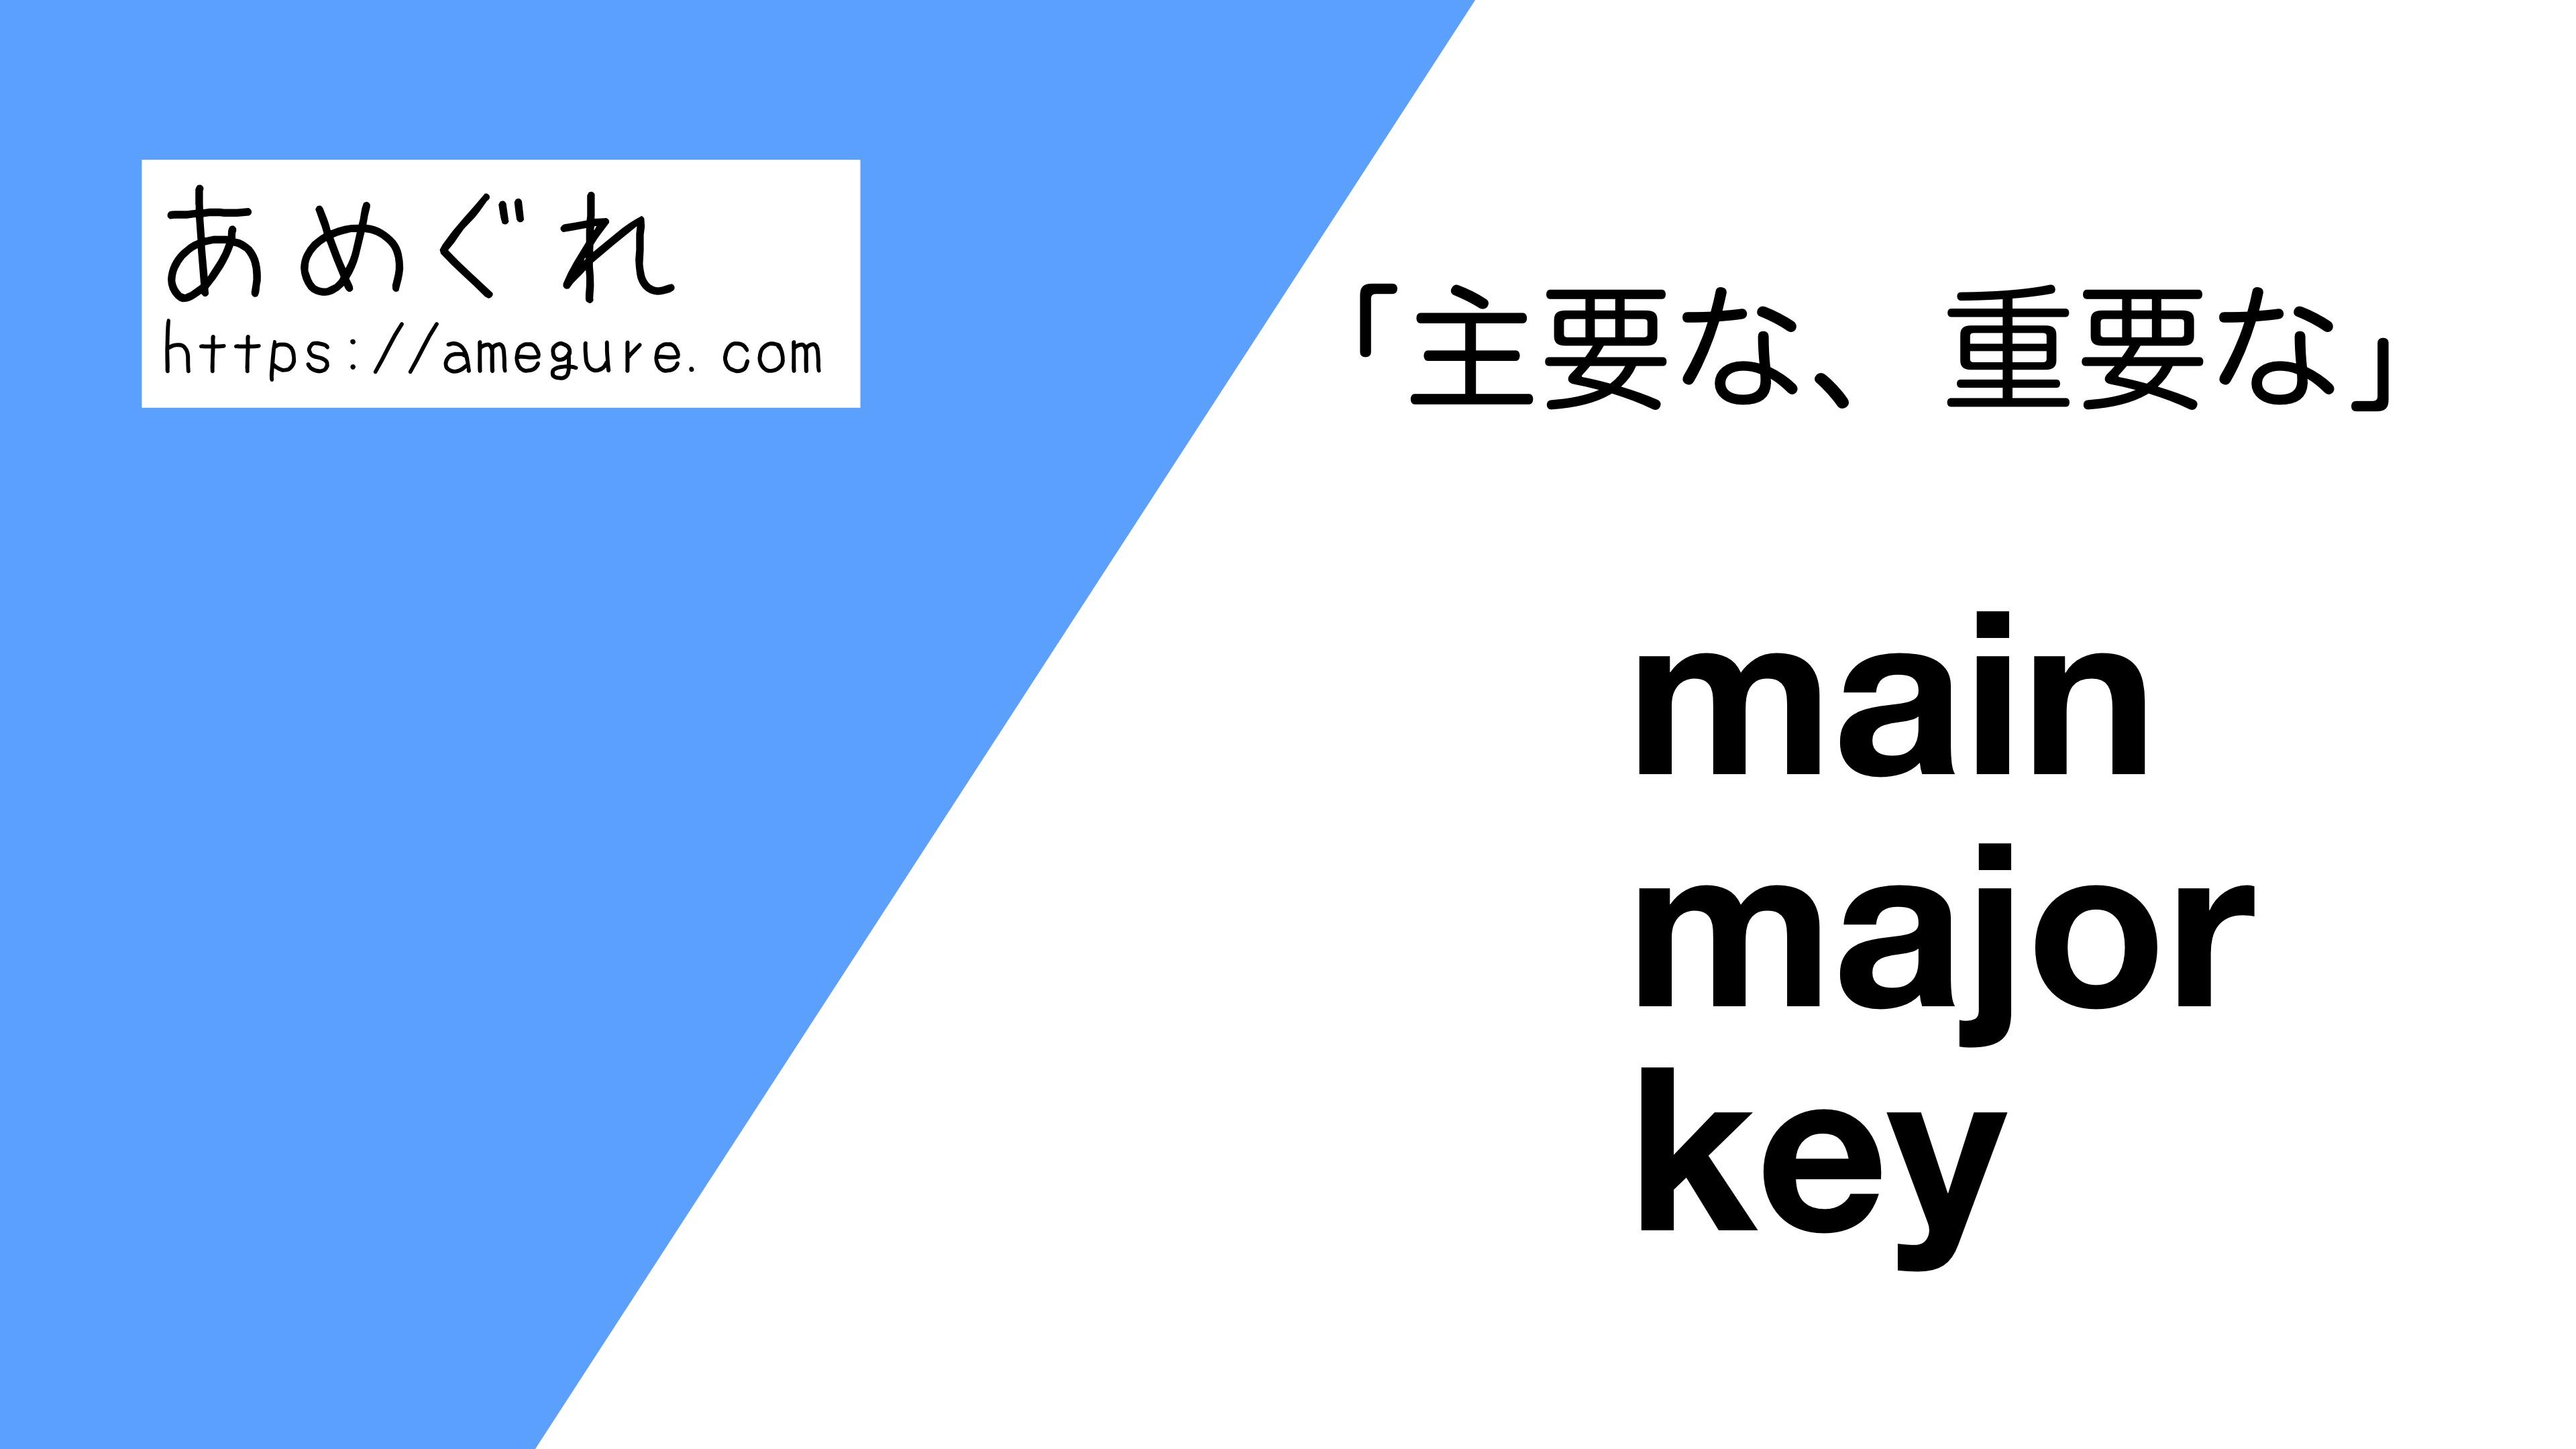 main-major-key違い